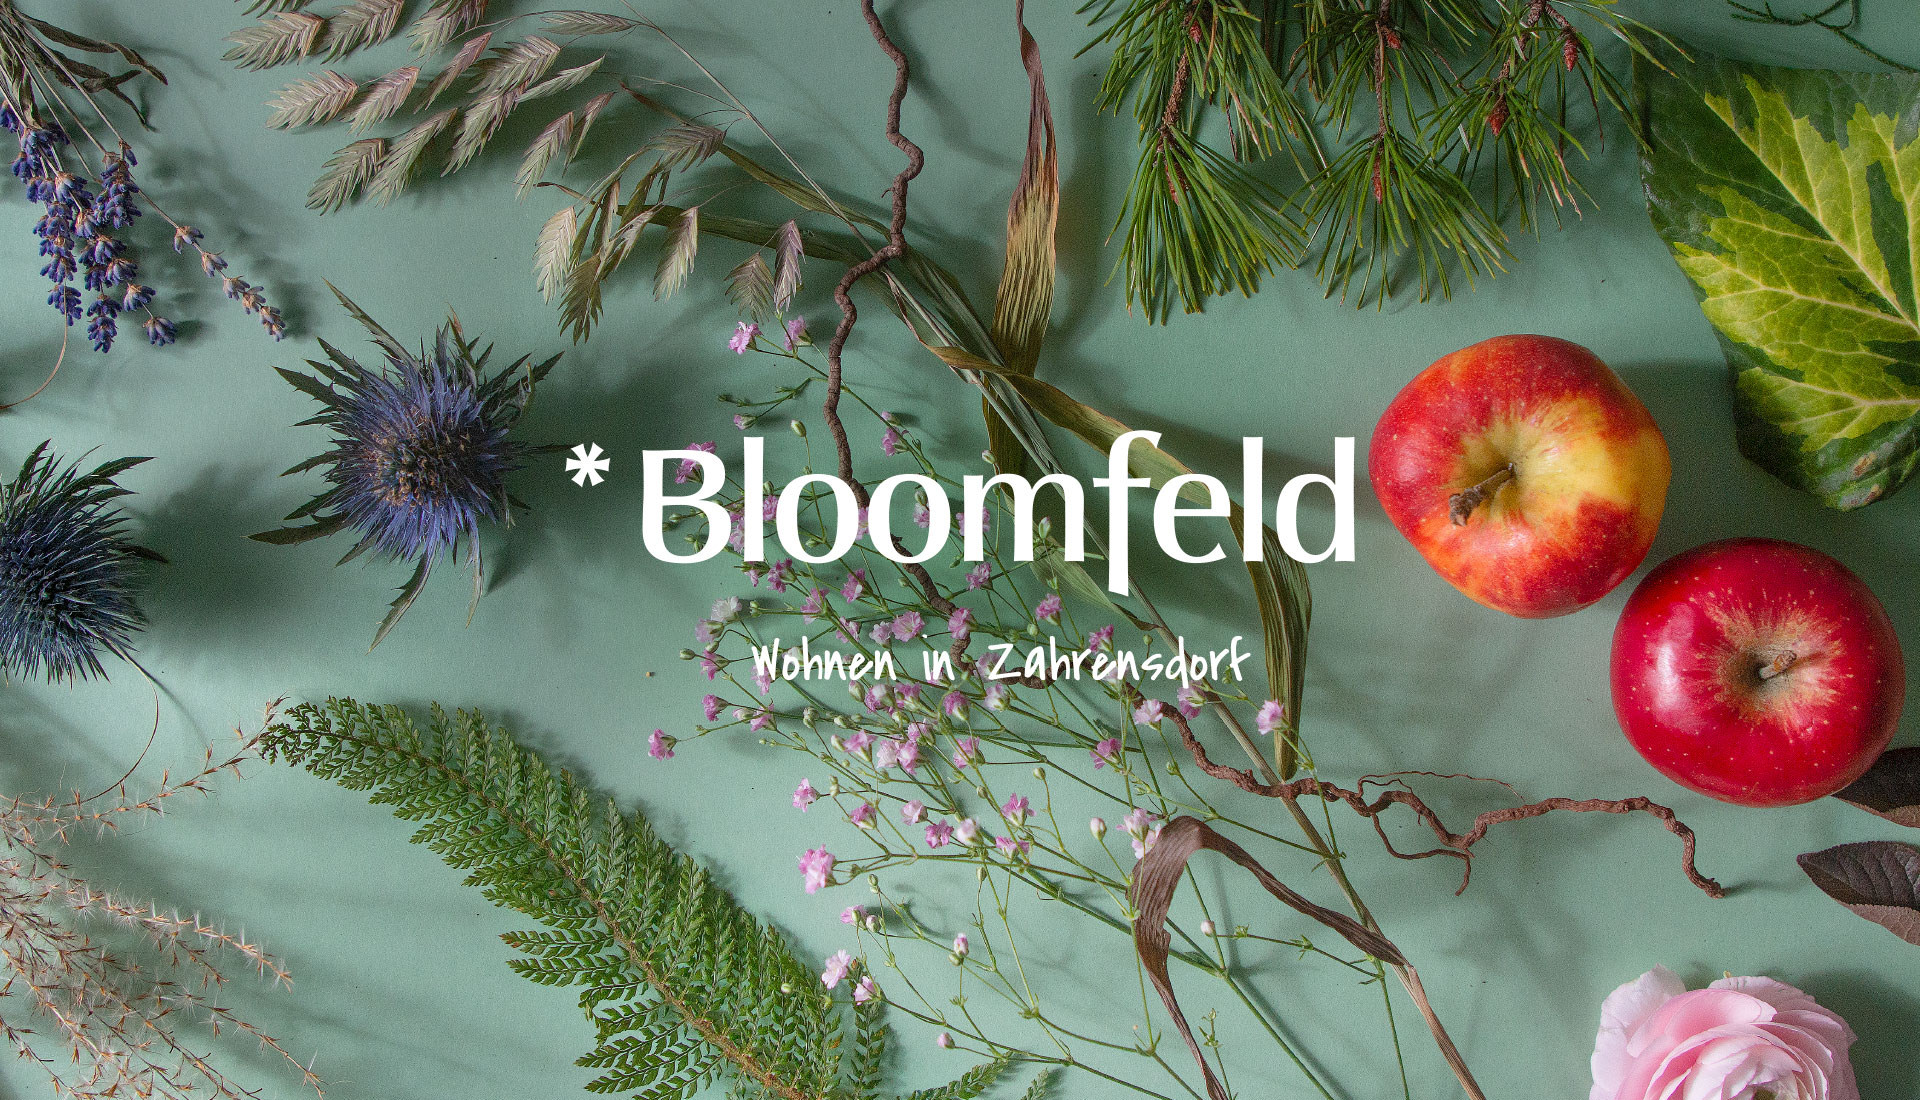 susanngreuel-bloomfeld-markendesign-keyvisual